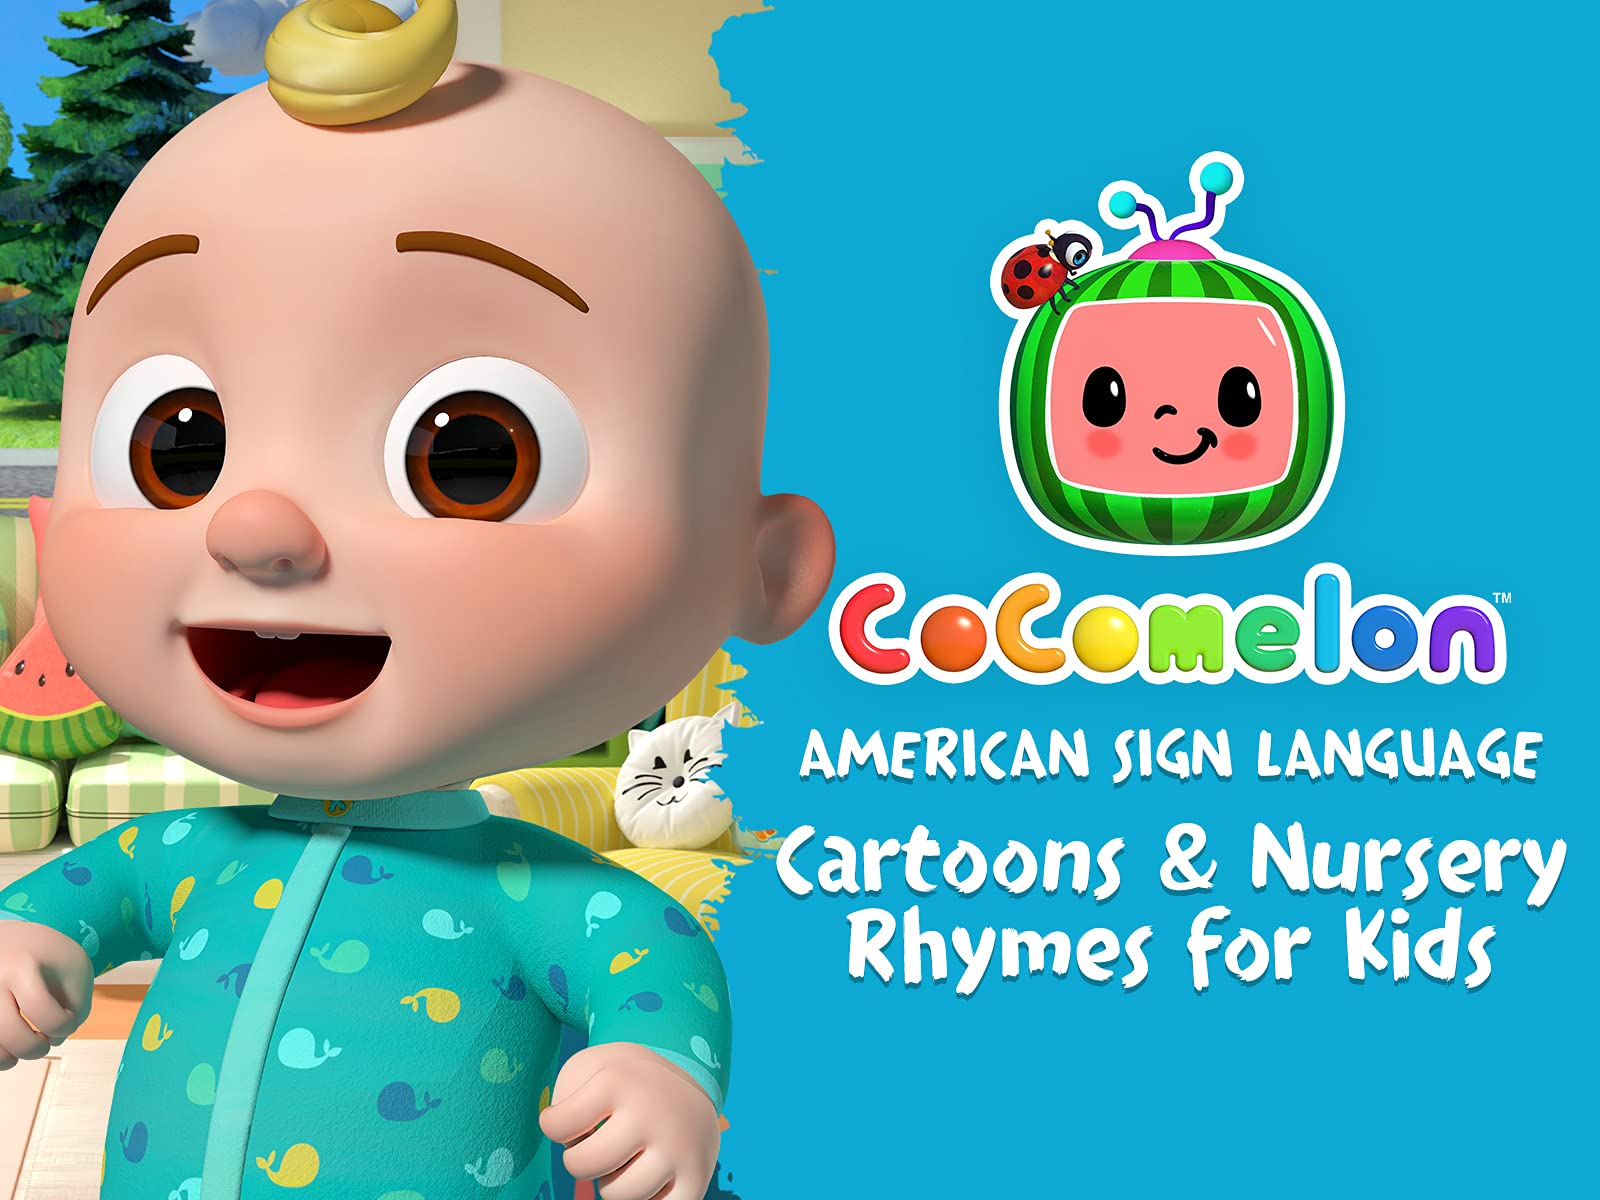 Cocomelon American Sign Language - Cartoons for Kids - Season 1